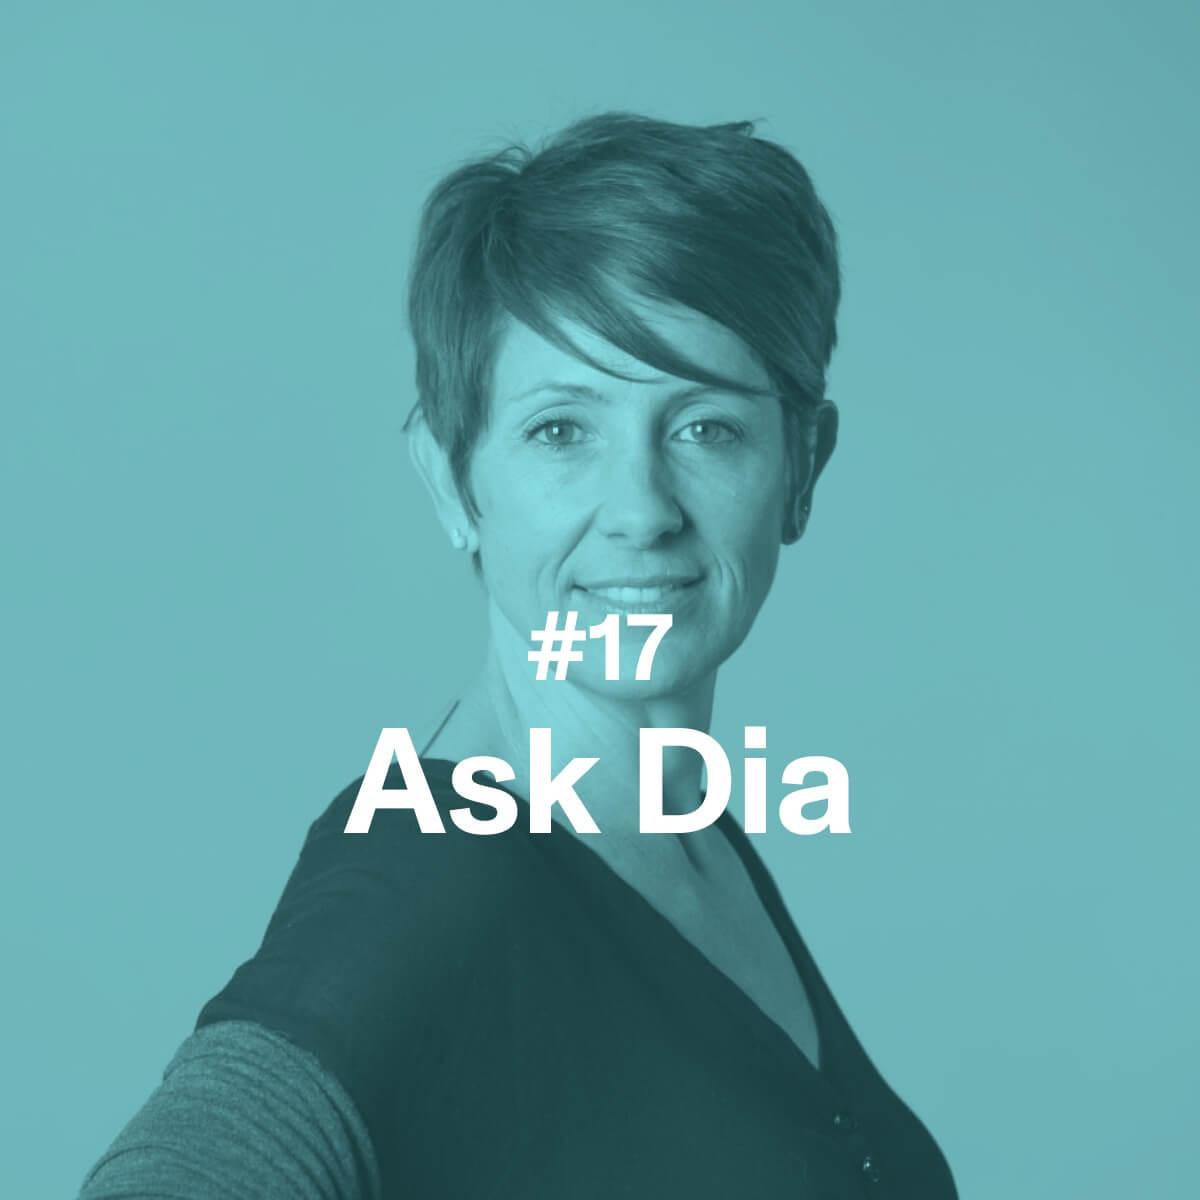 Ask Dia: Presenting to my Execs and Defending Myself